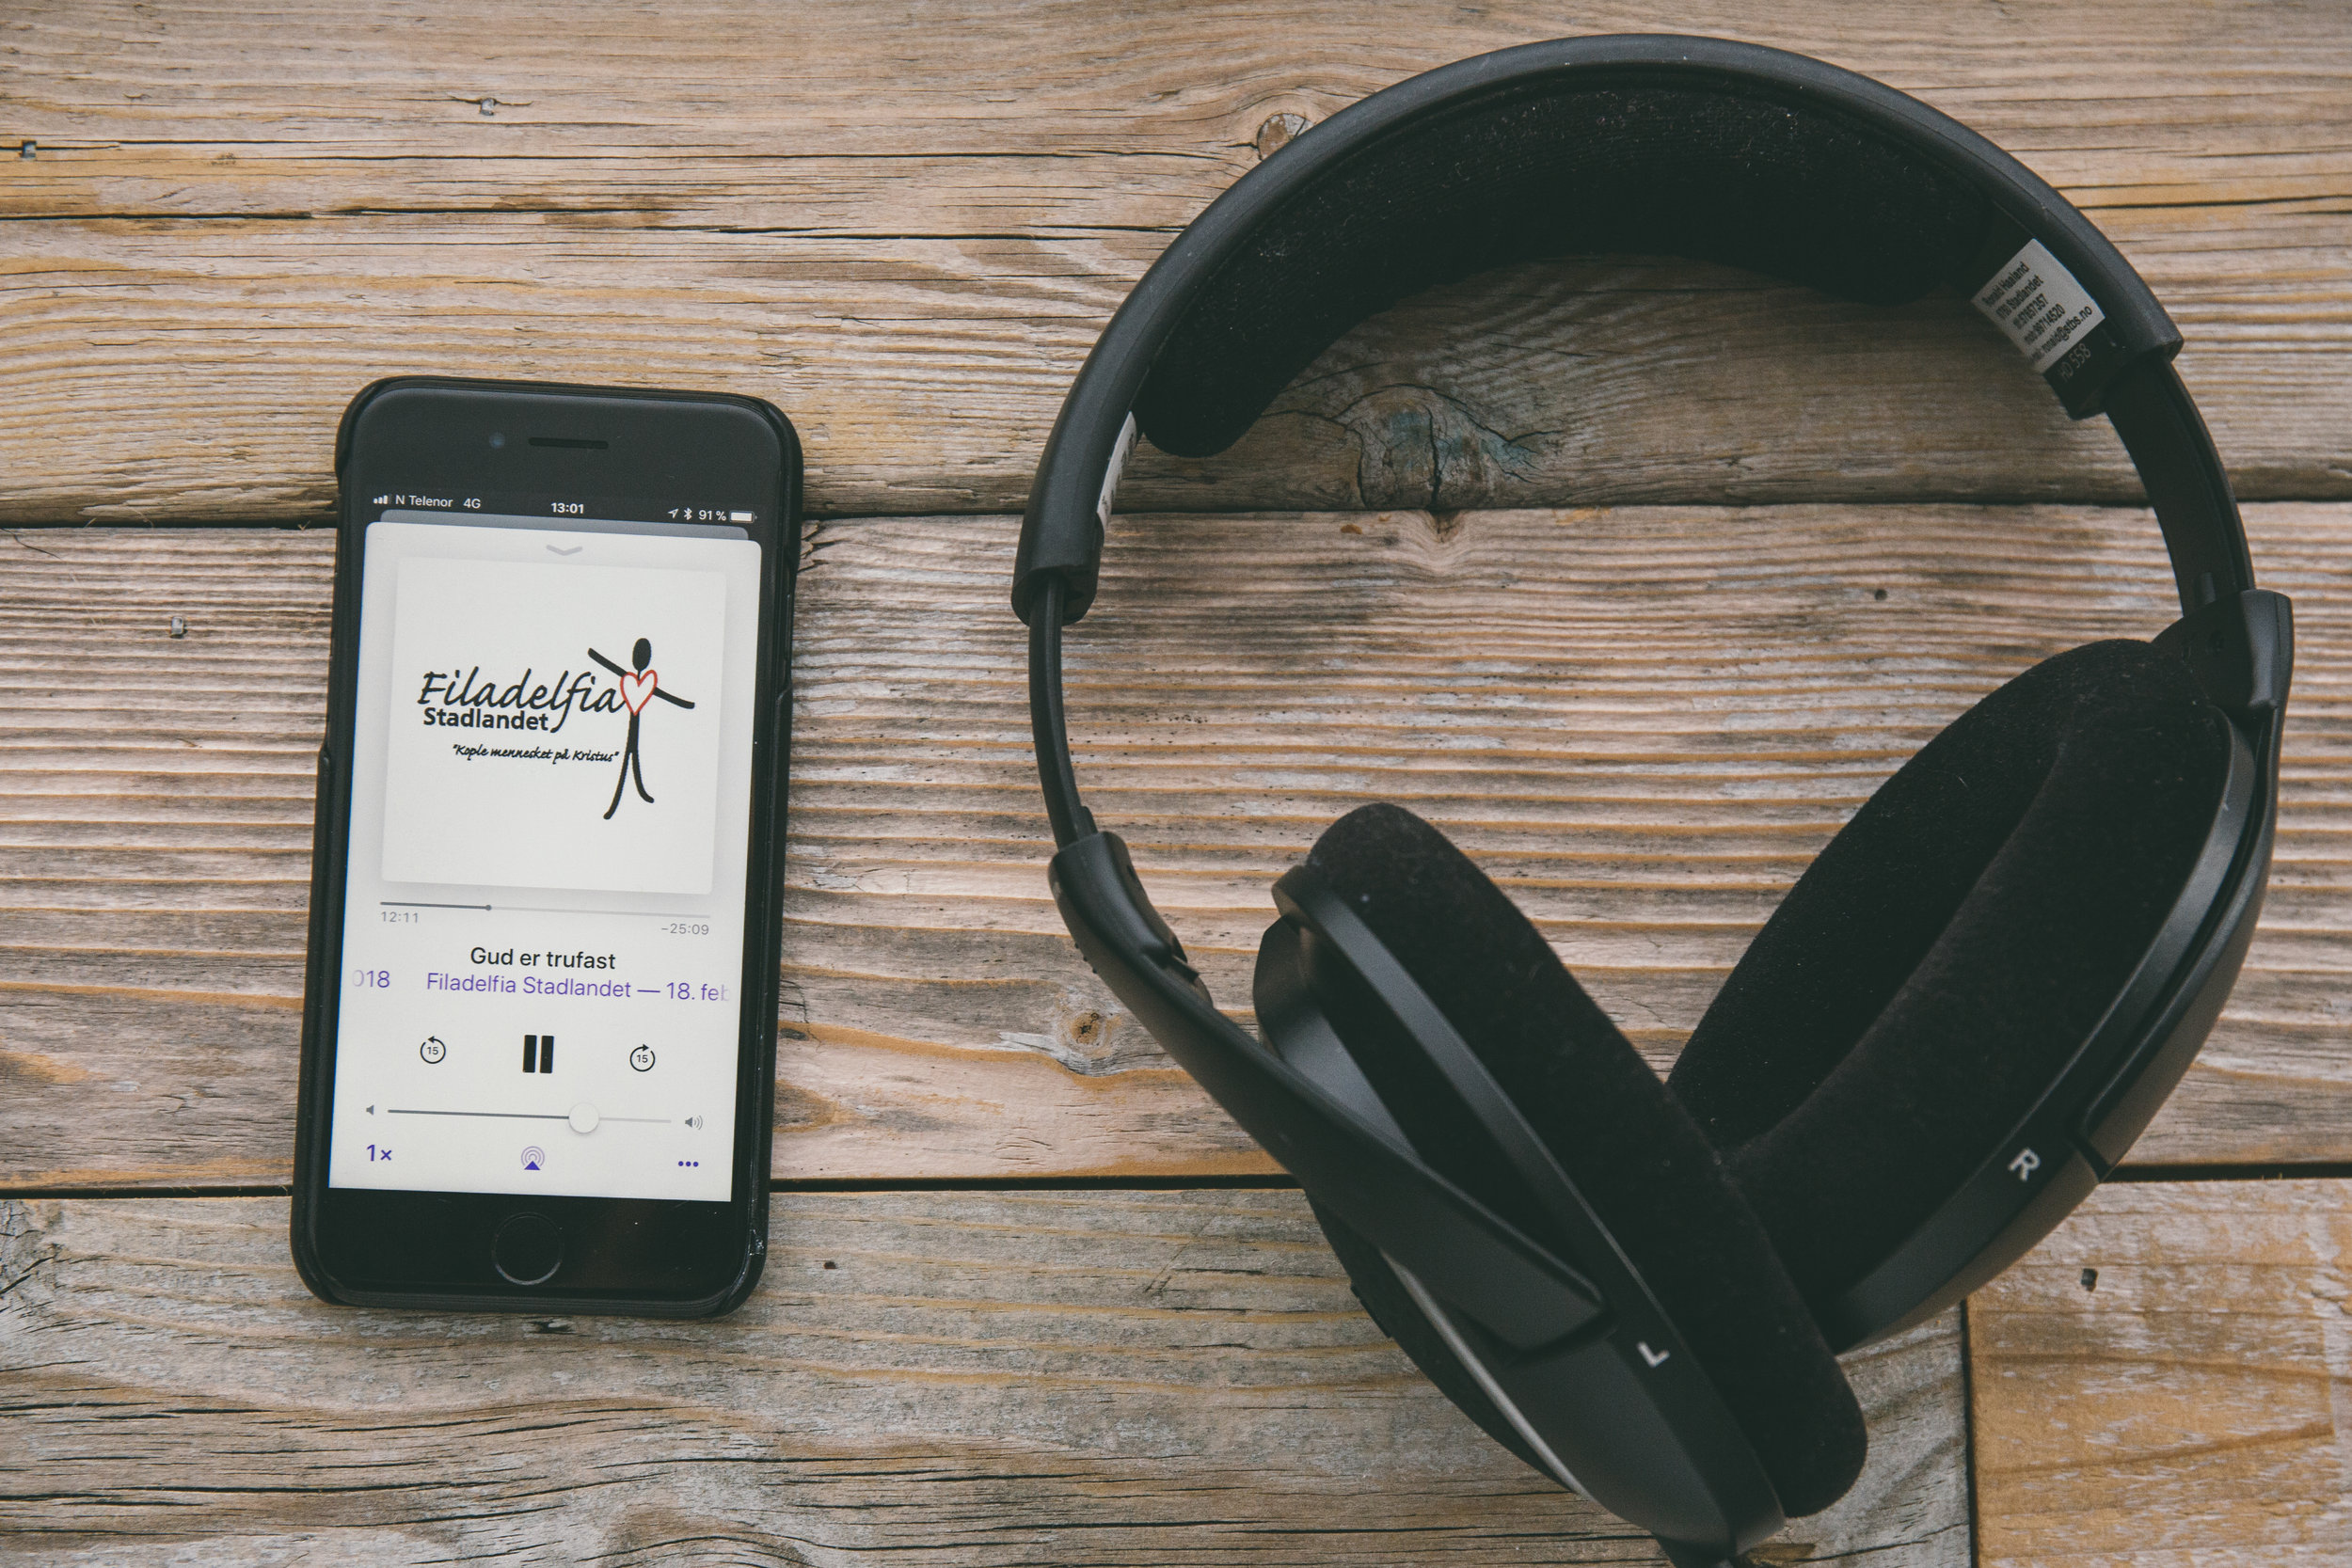 podcast_filadelfia-9300.jpg